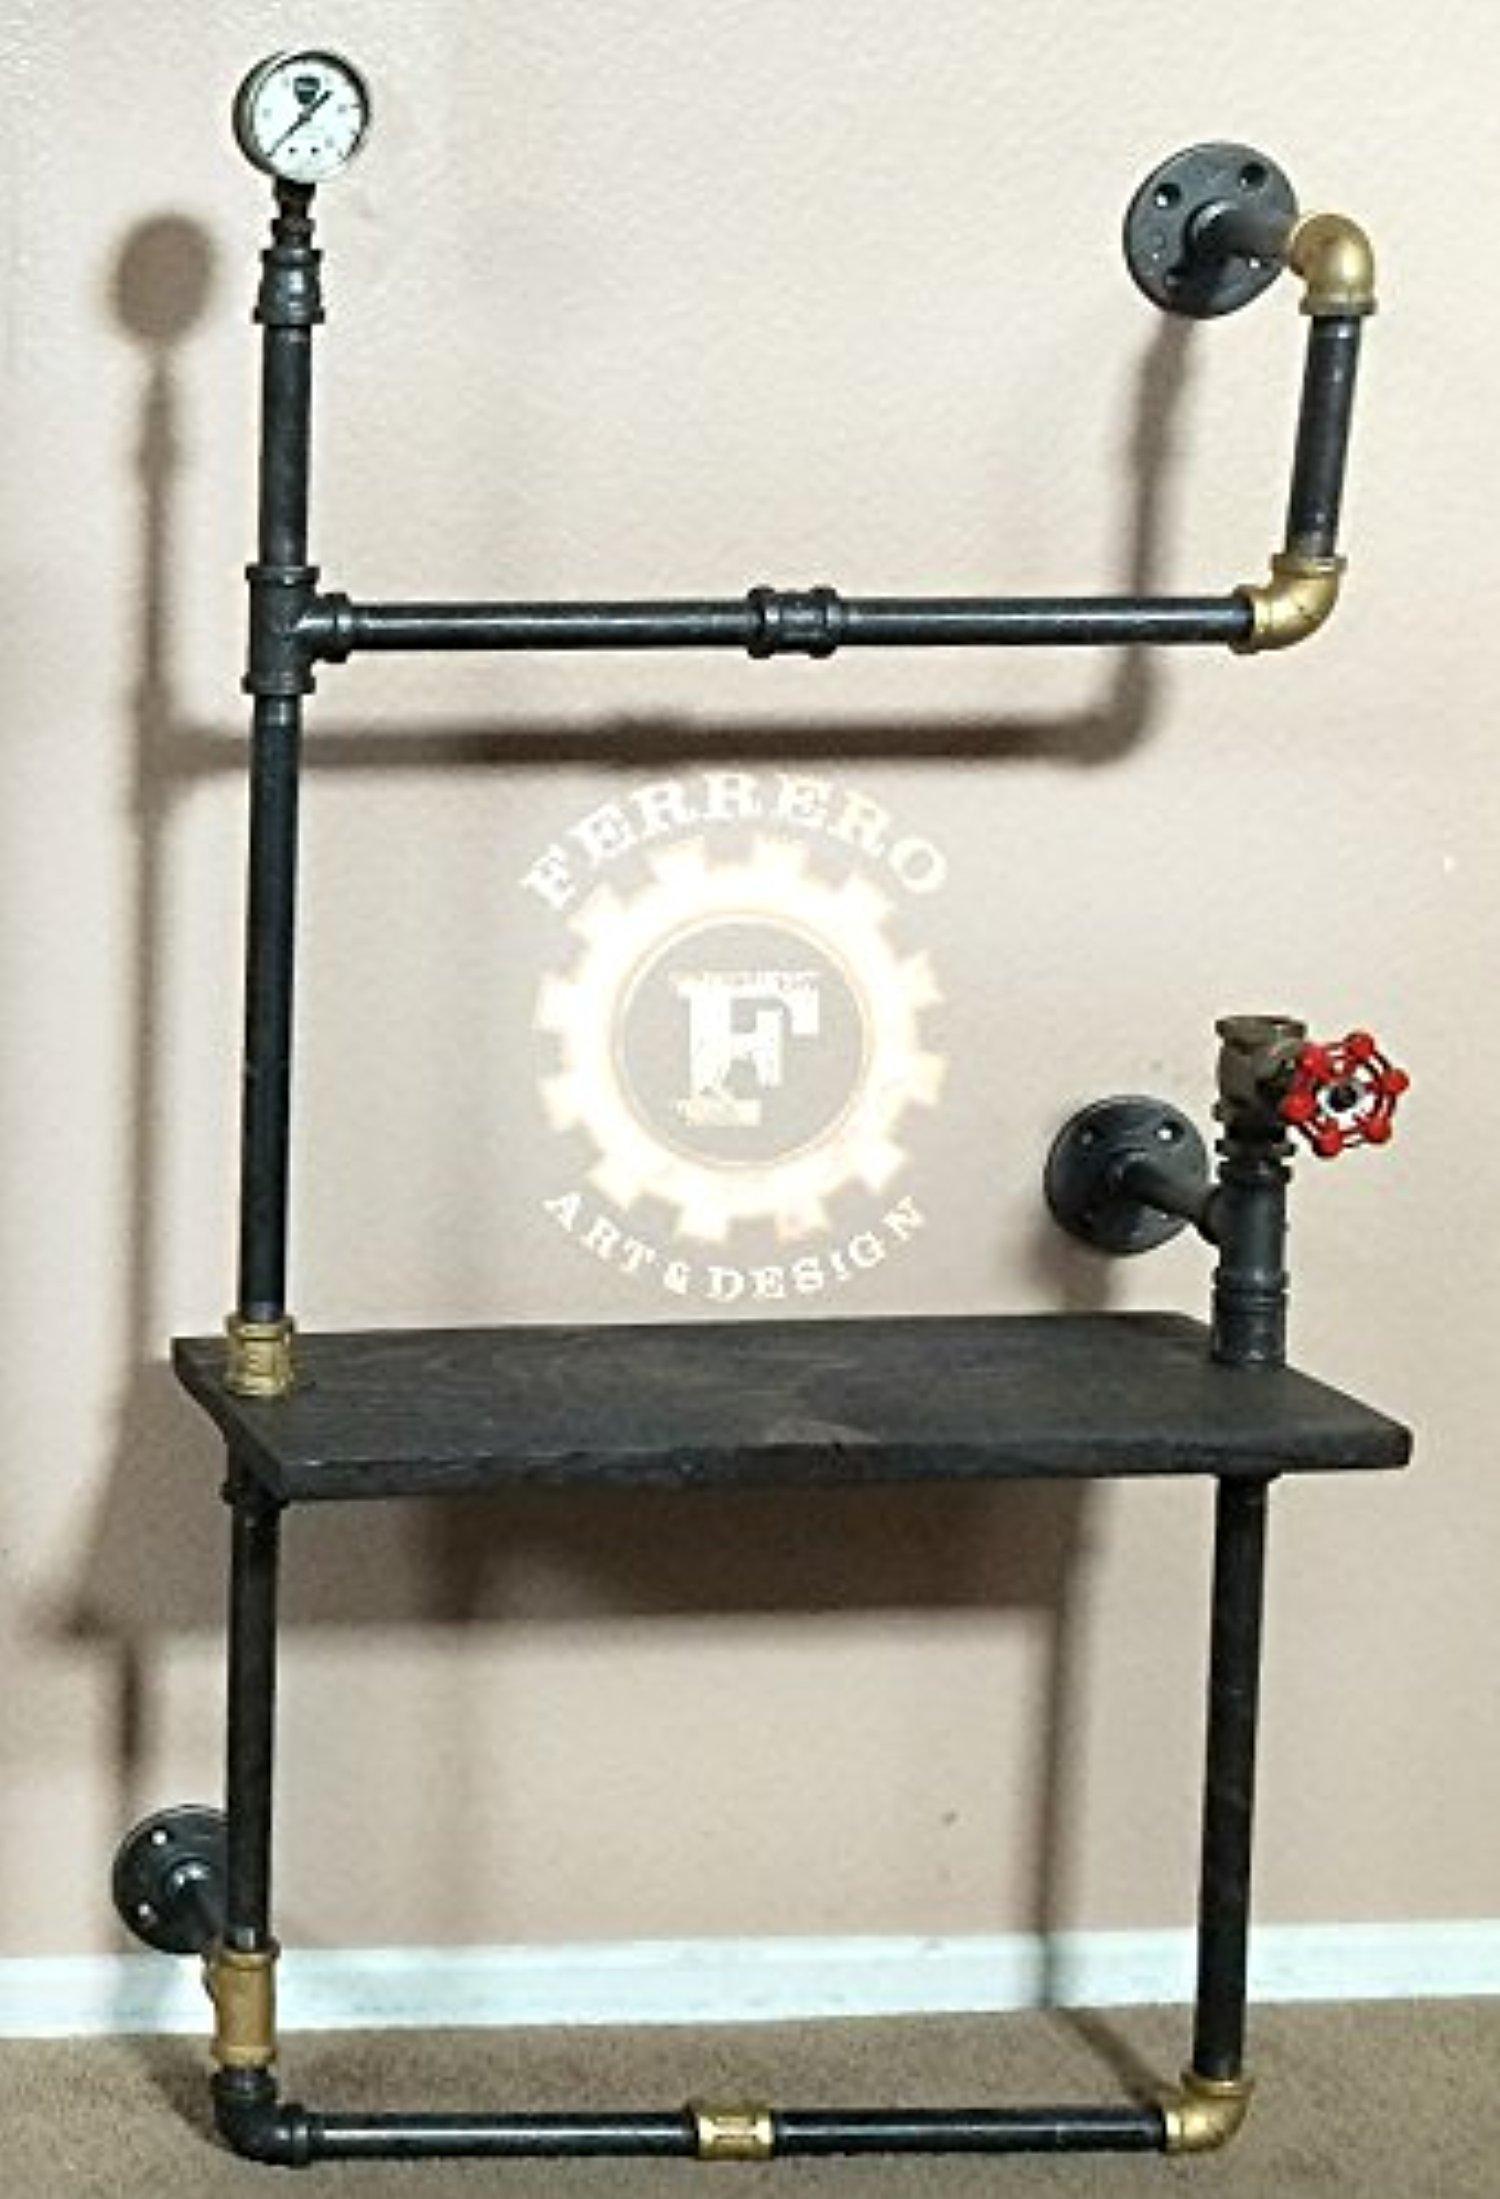 Steampunk Shelf, Unique Wall Decor, Industrial Decor, Pipe Shelf, Wood Shelf, Steampunk Style, Modern Decor, Upcycle Decor